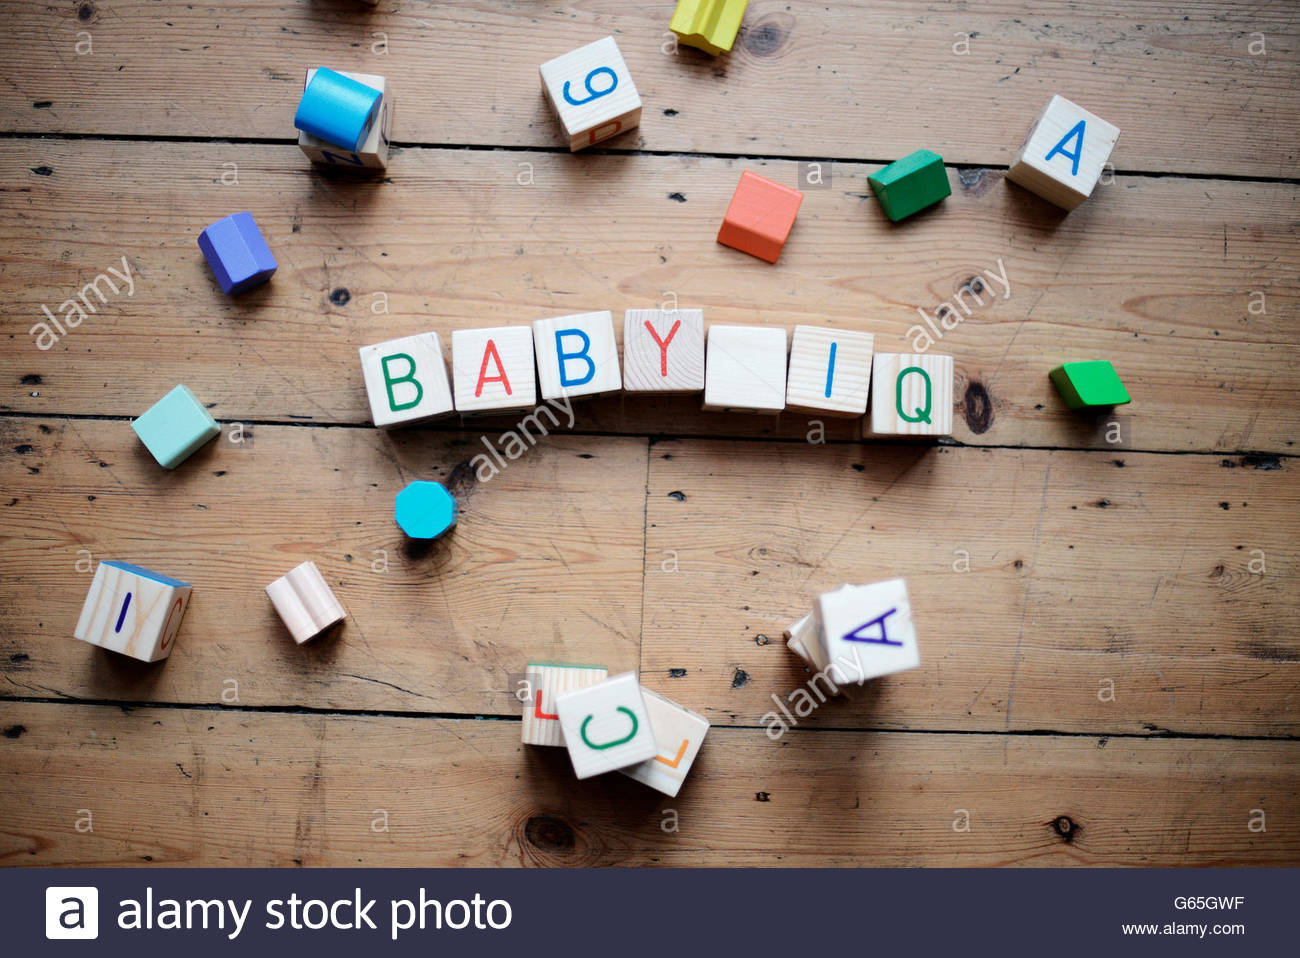 Baby IQ play blocks on wooden floor - Stock Image